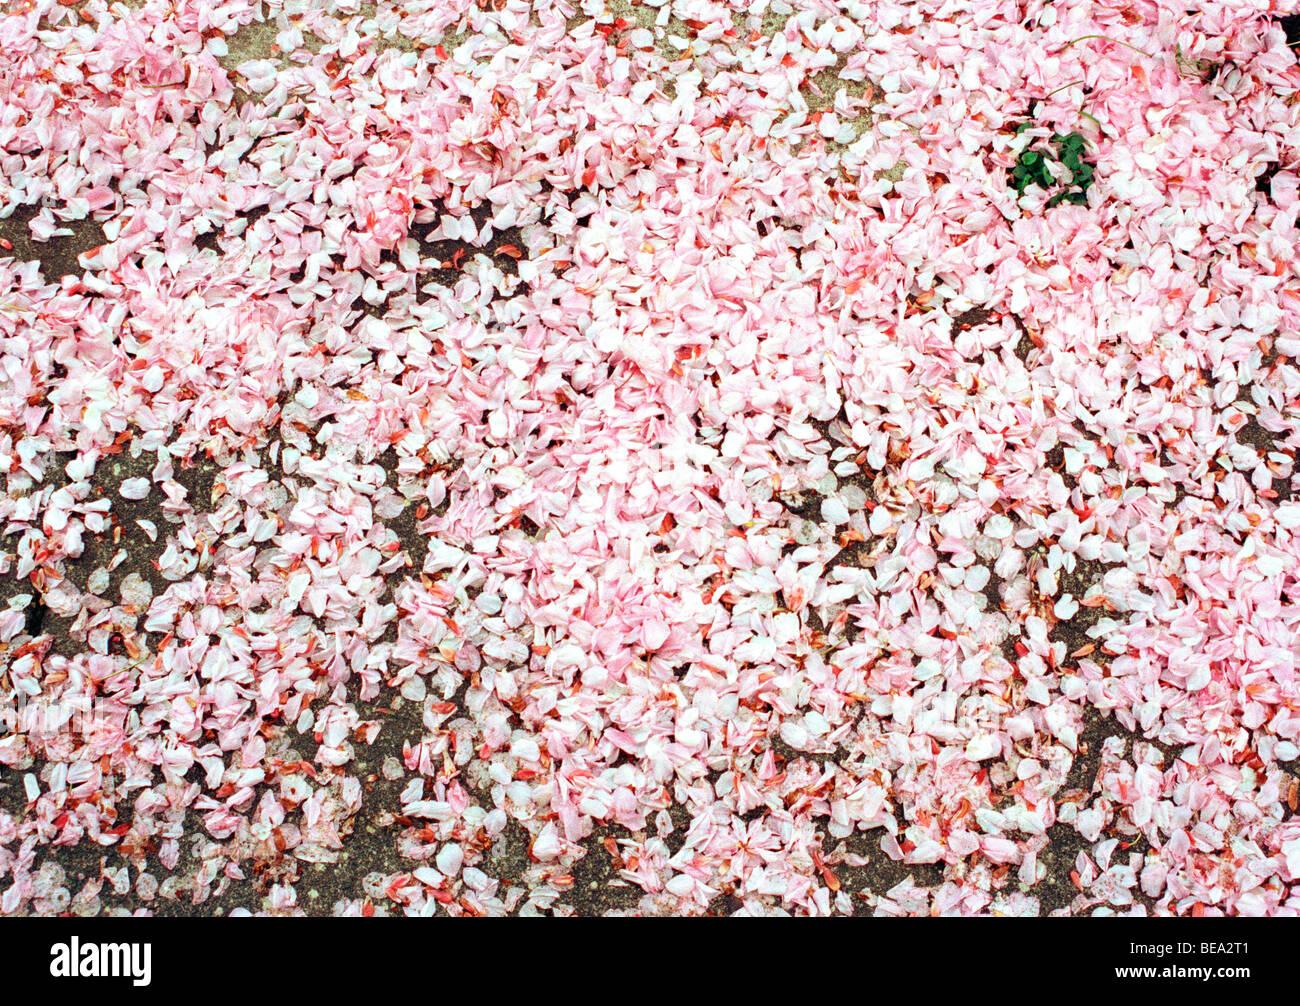 Large Pile Pink Flower Petals Stock Photos Large Pile Pink Flower